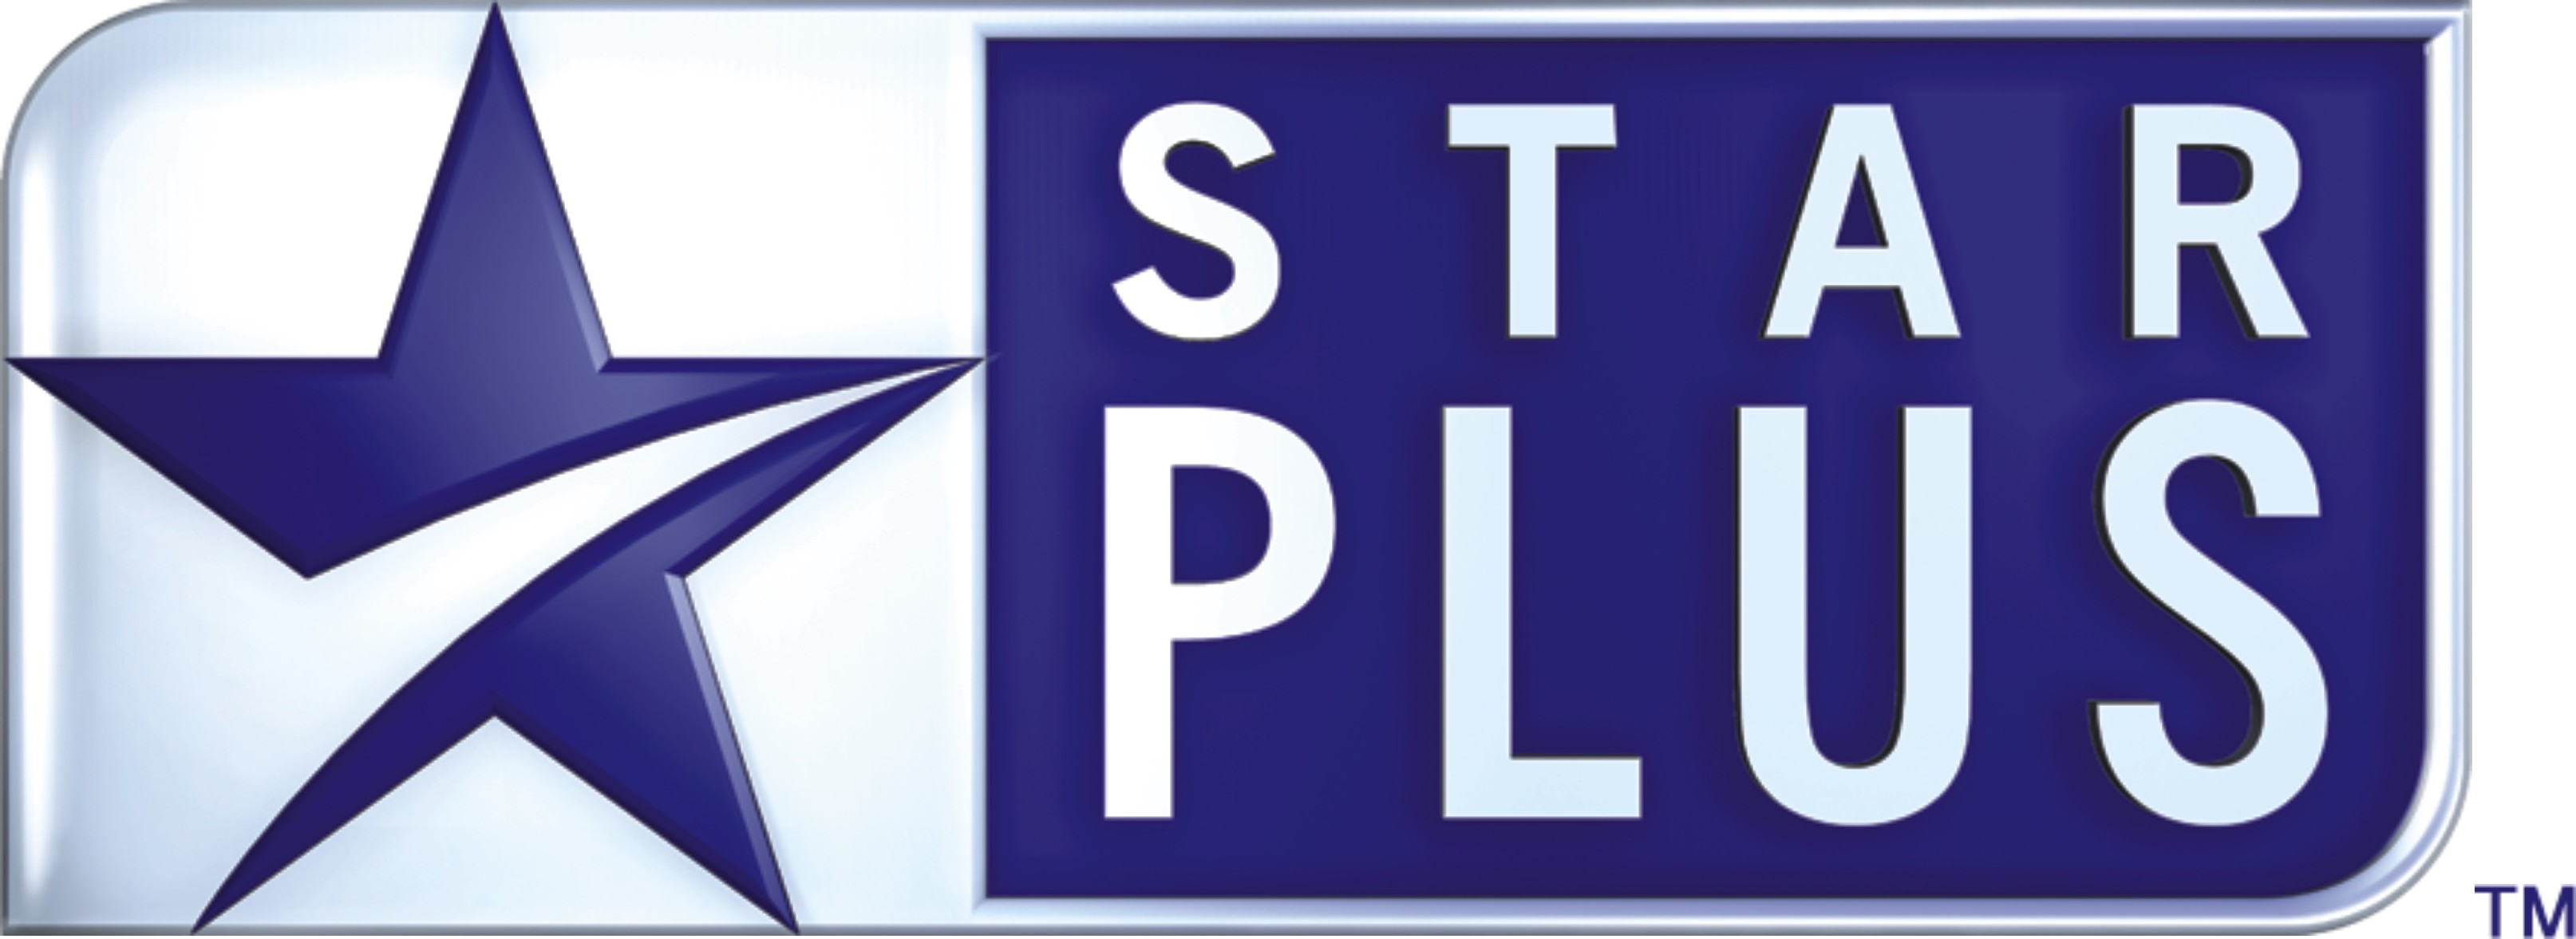 Star Plus Logo.png - Star Movies Logo PNG